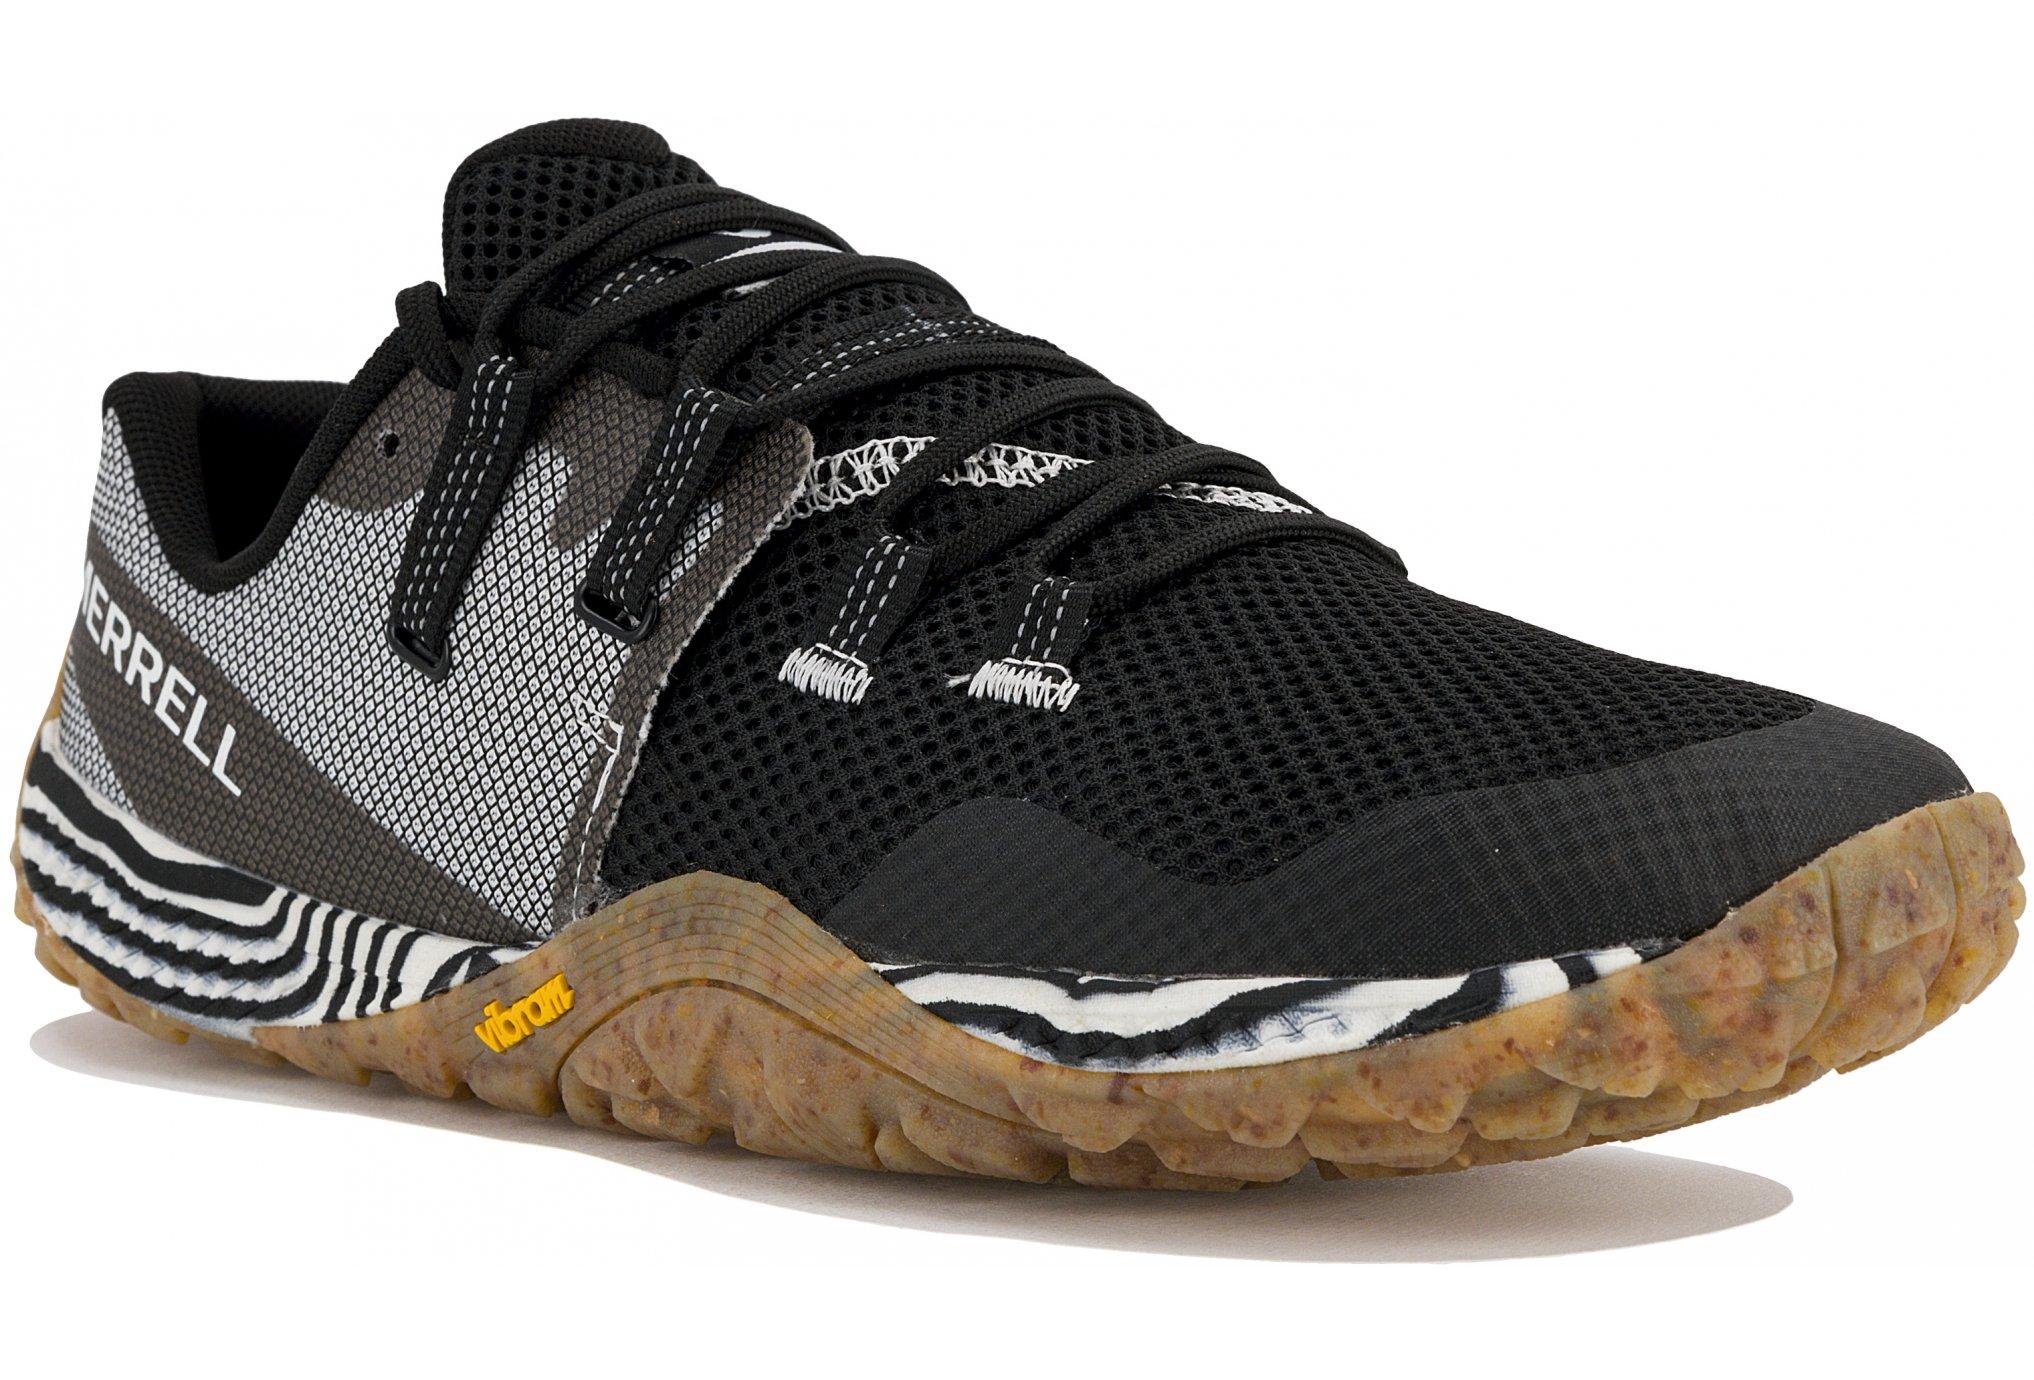 Merrell Trail Glove 6 Solution Dye M Chaussures homme